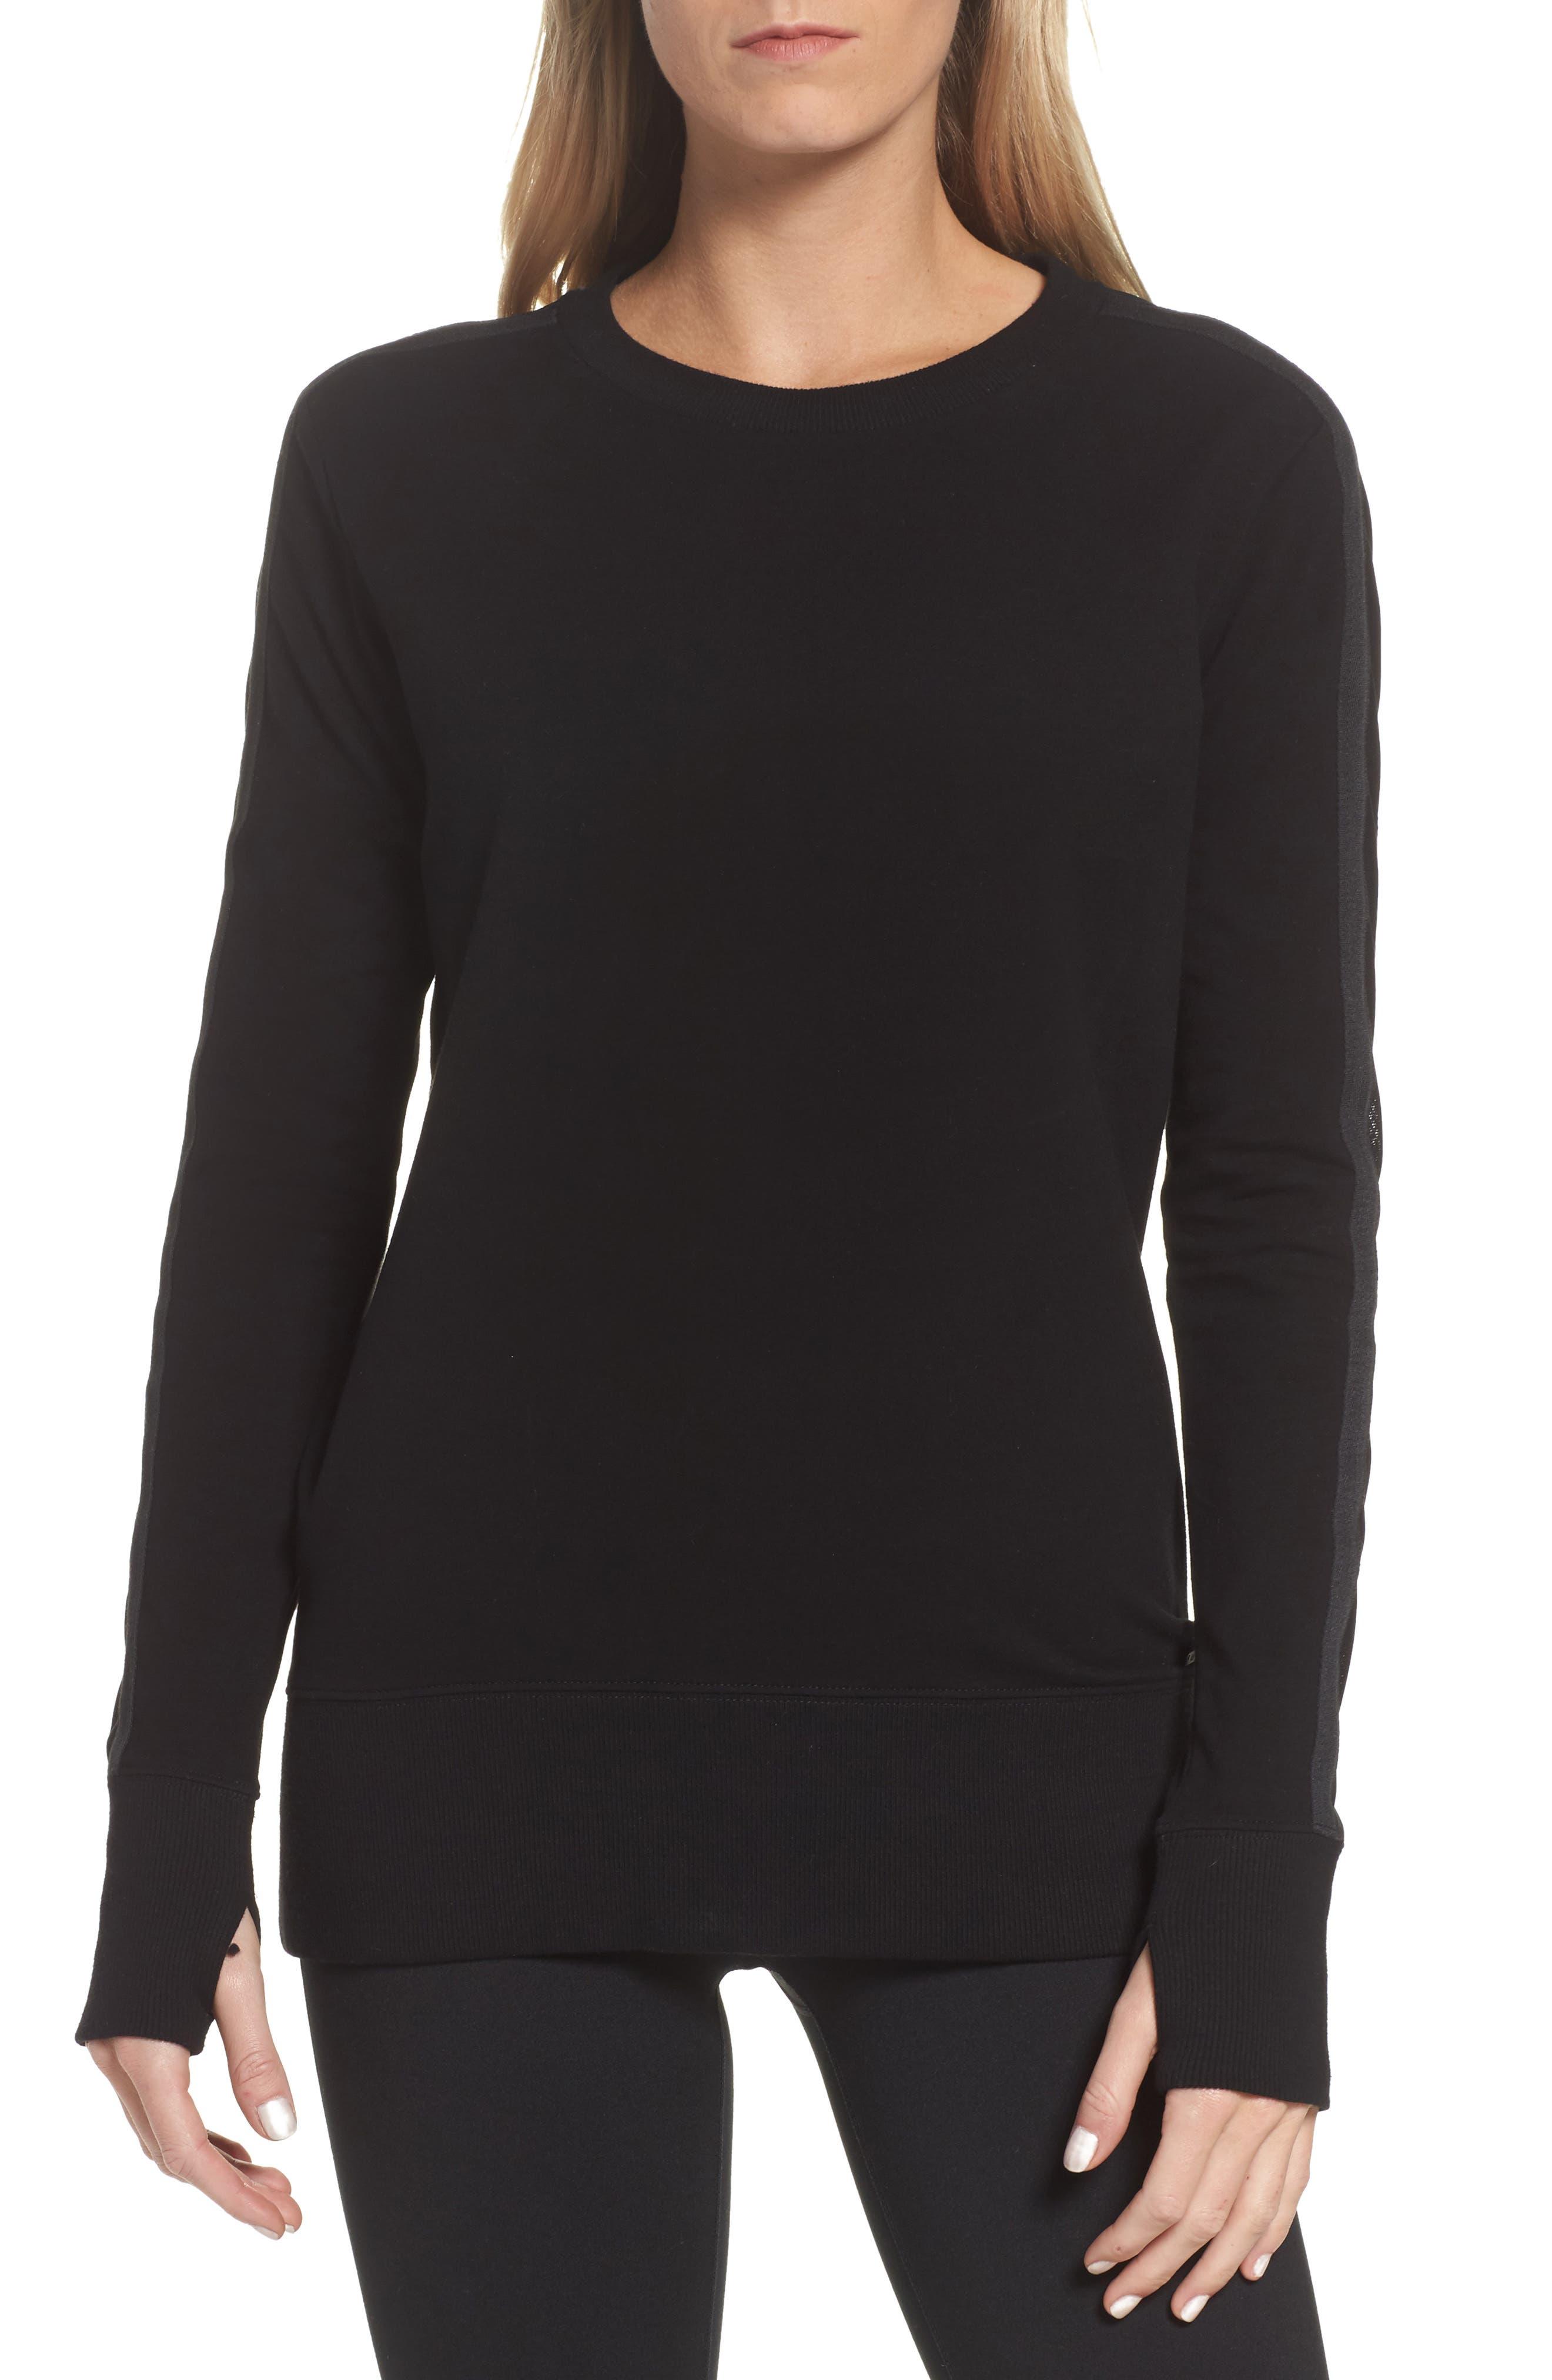 Alternate Image 1 Selected - Blanc Noir Social Sweatshirt